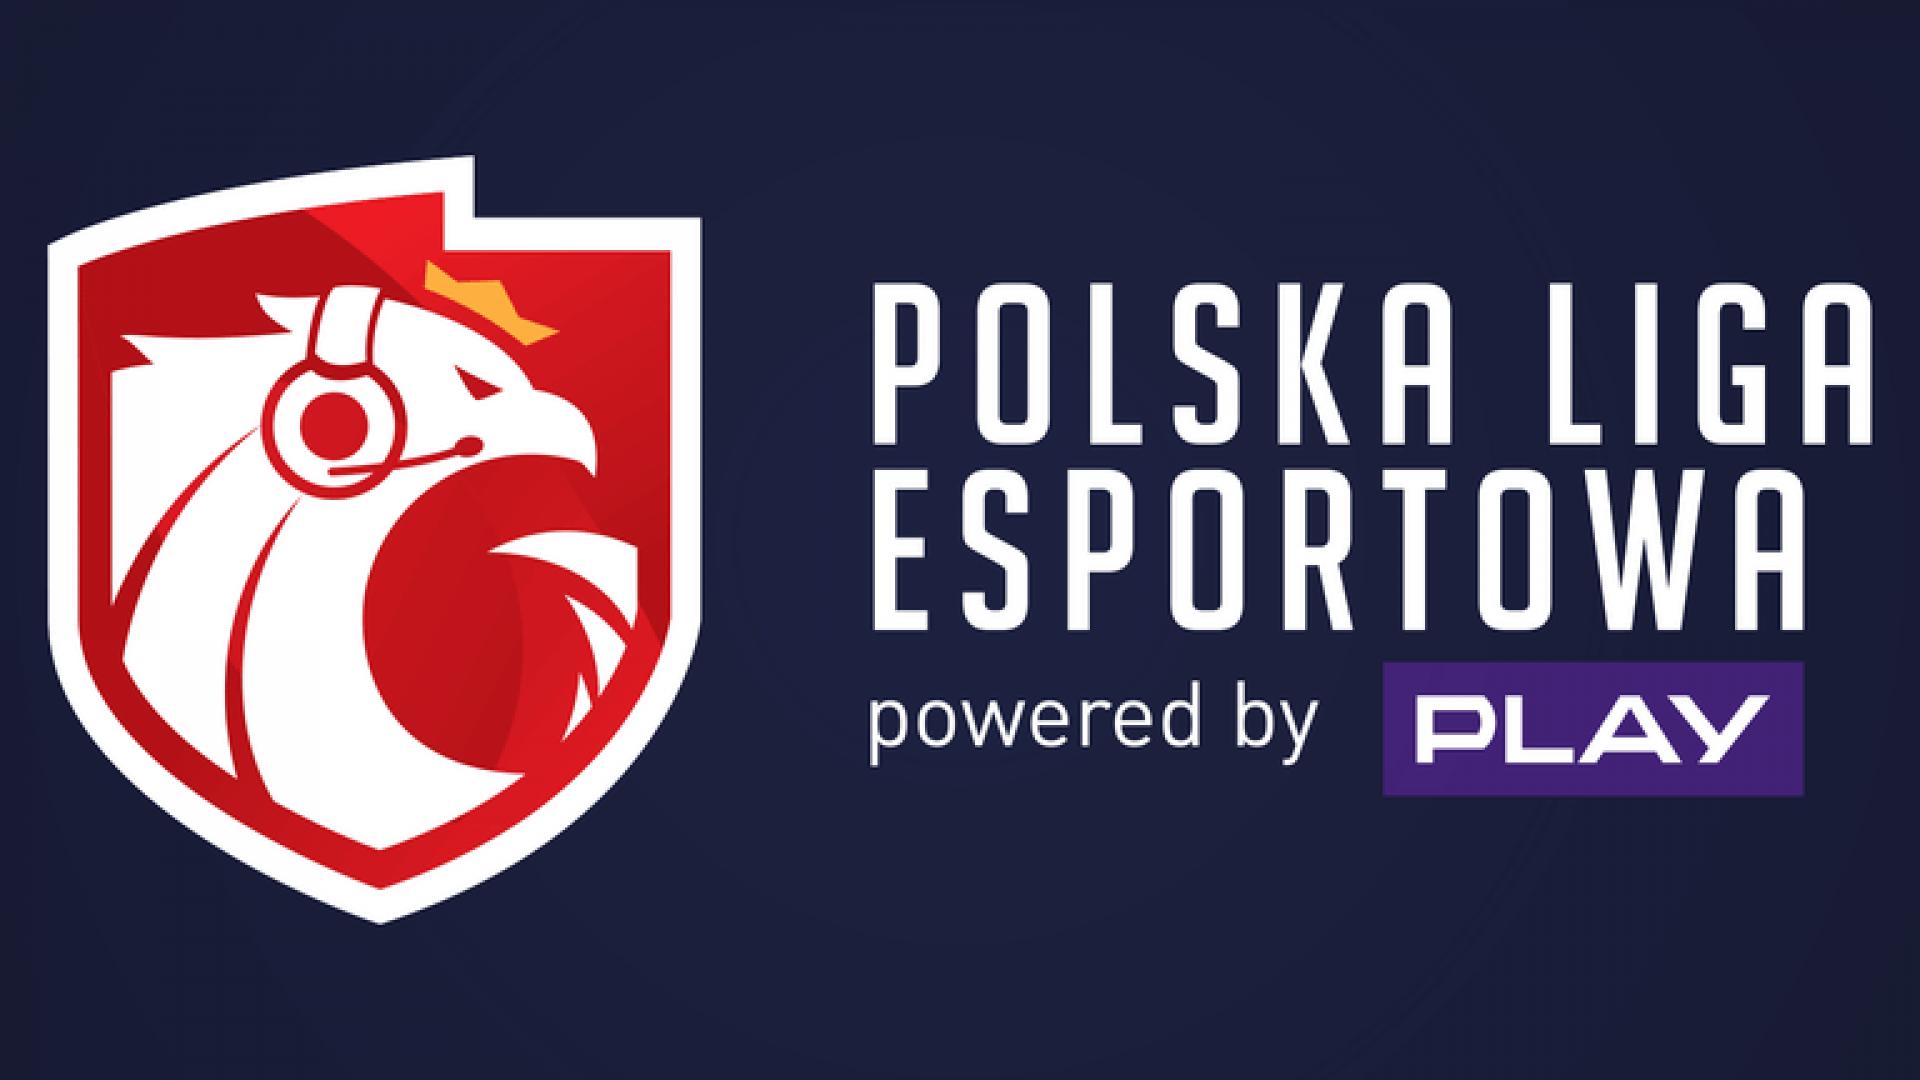 https://inetkox.pl/wp-content/uploads/2017/09/plezapowiedz.png